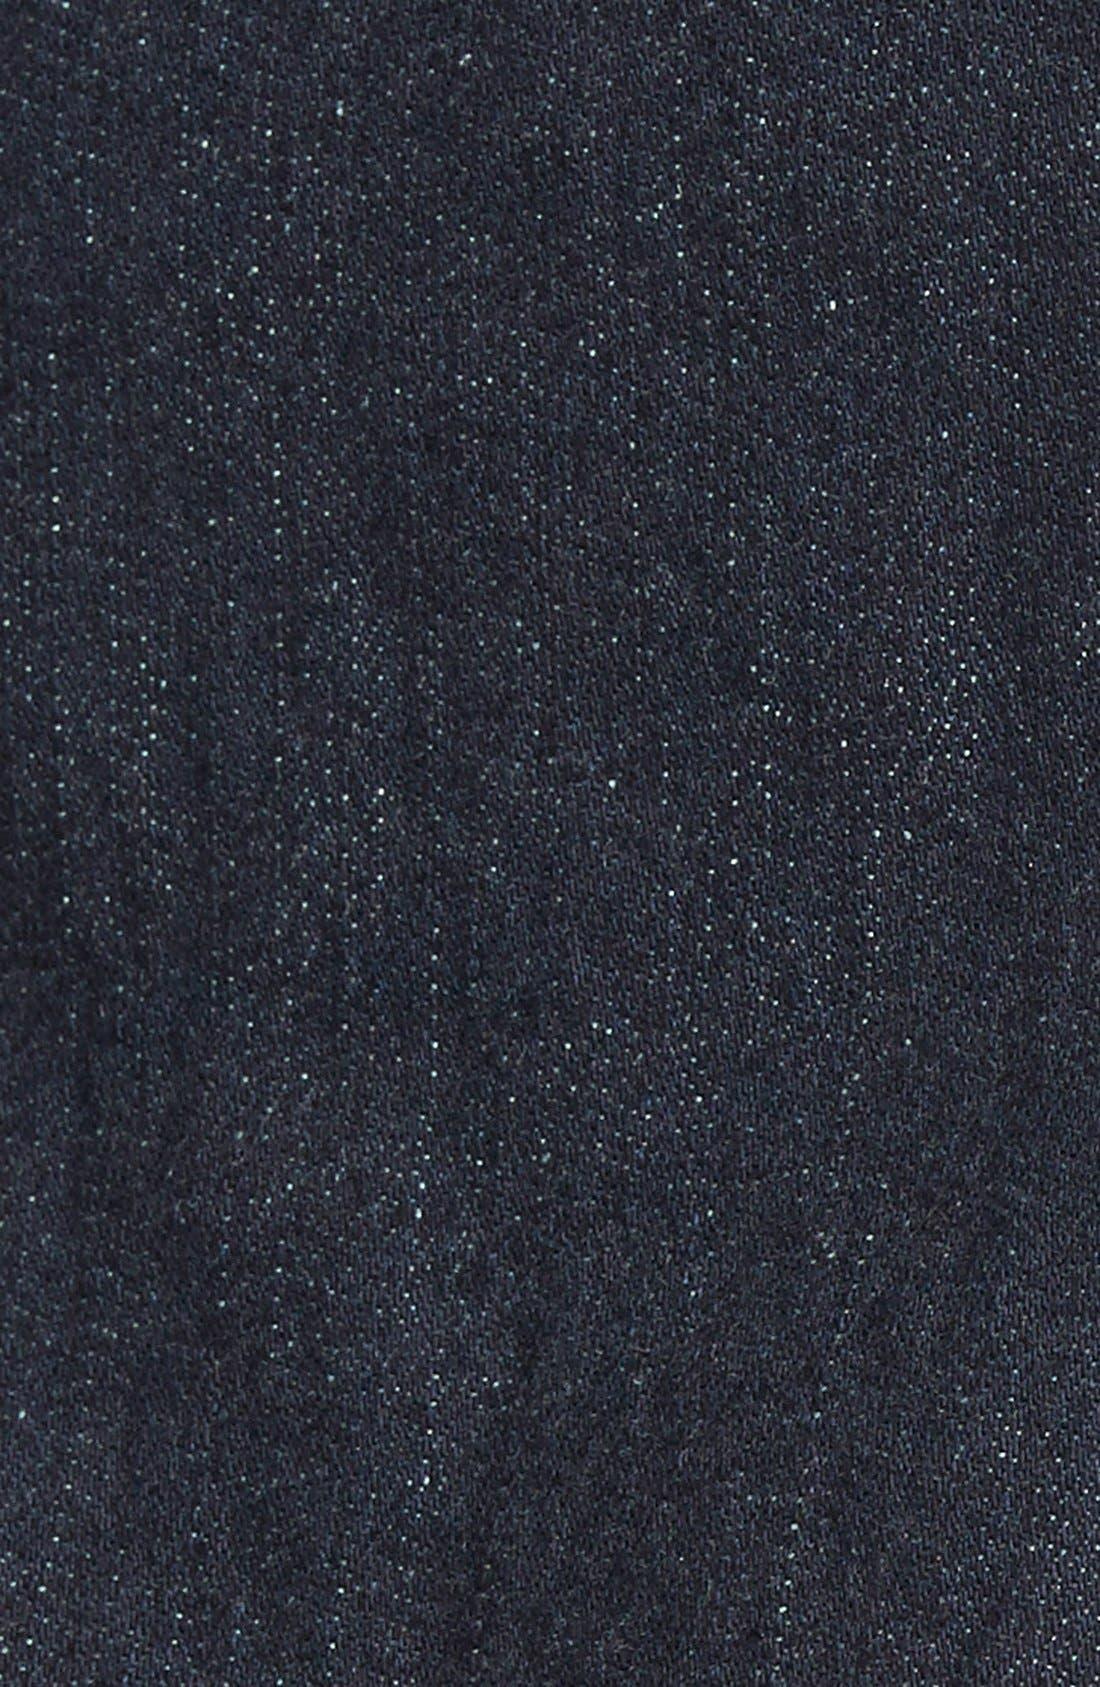 Alternate Image 3  - Alexa Chung for AG 'The Kety' A-Line Denim Skirt (Loan Star)